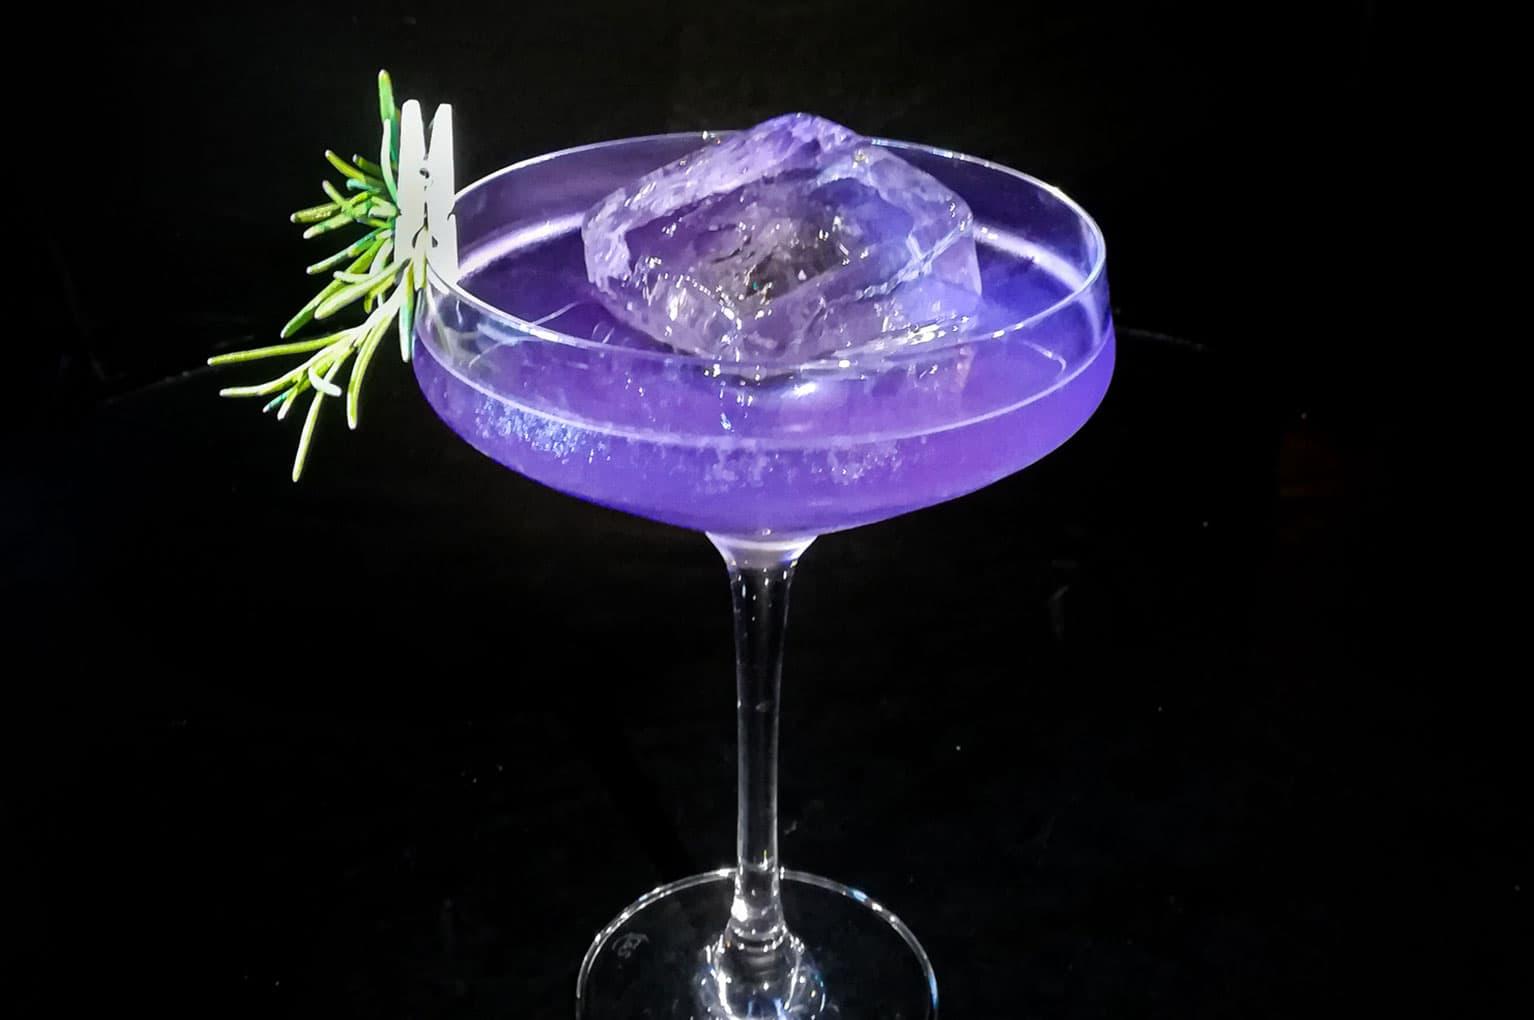 Brockmans Gin Brocktail second place cocktail